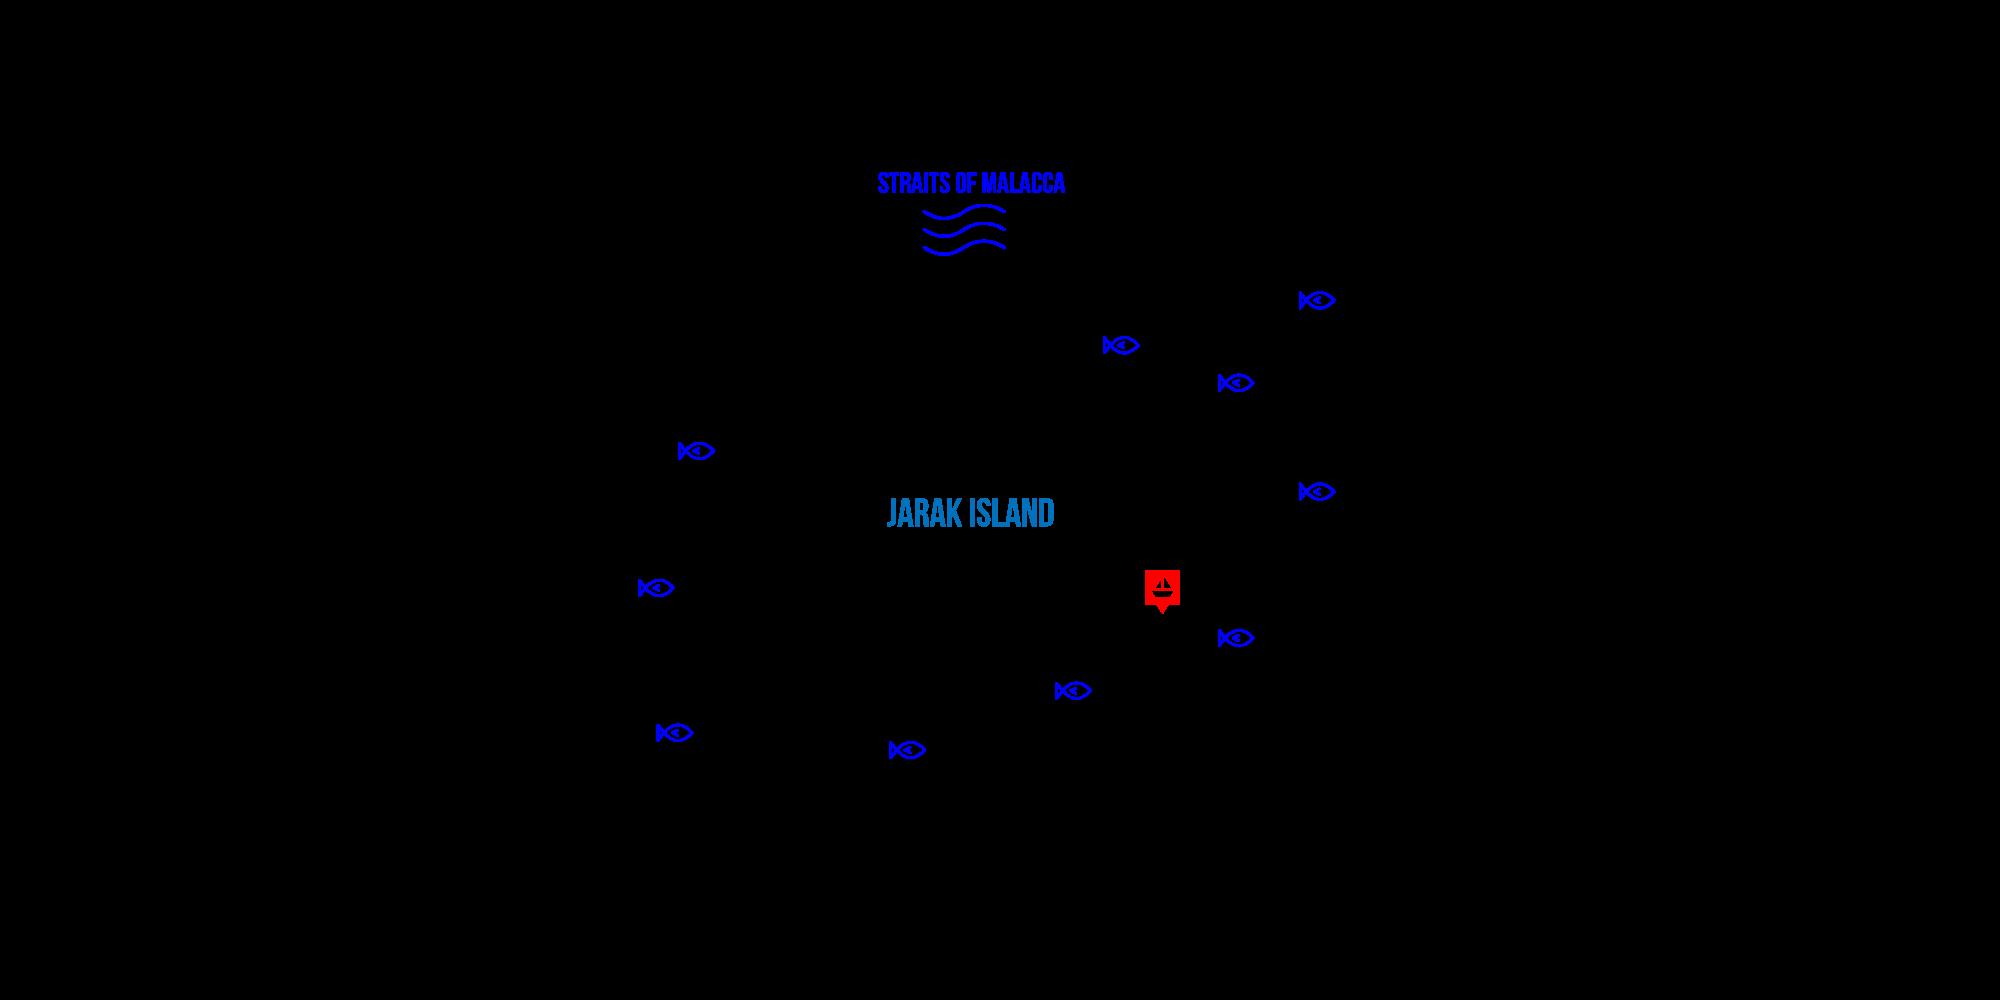 jarak island map